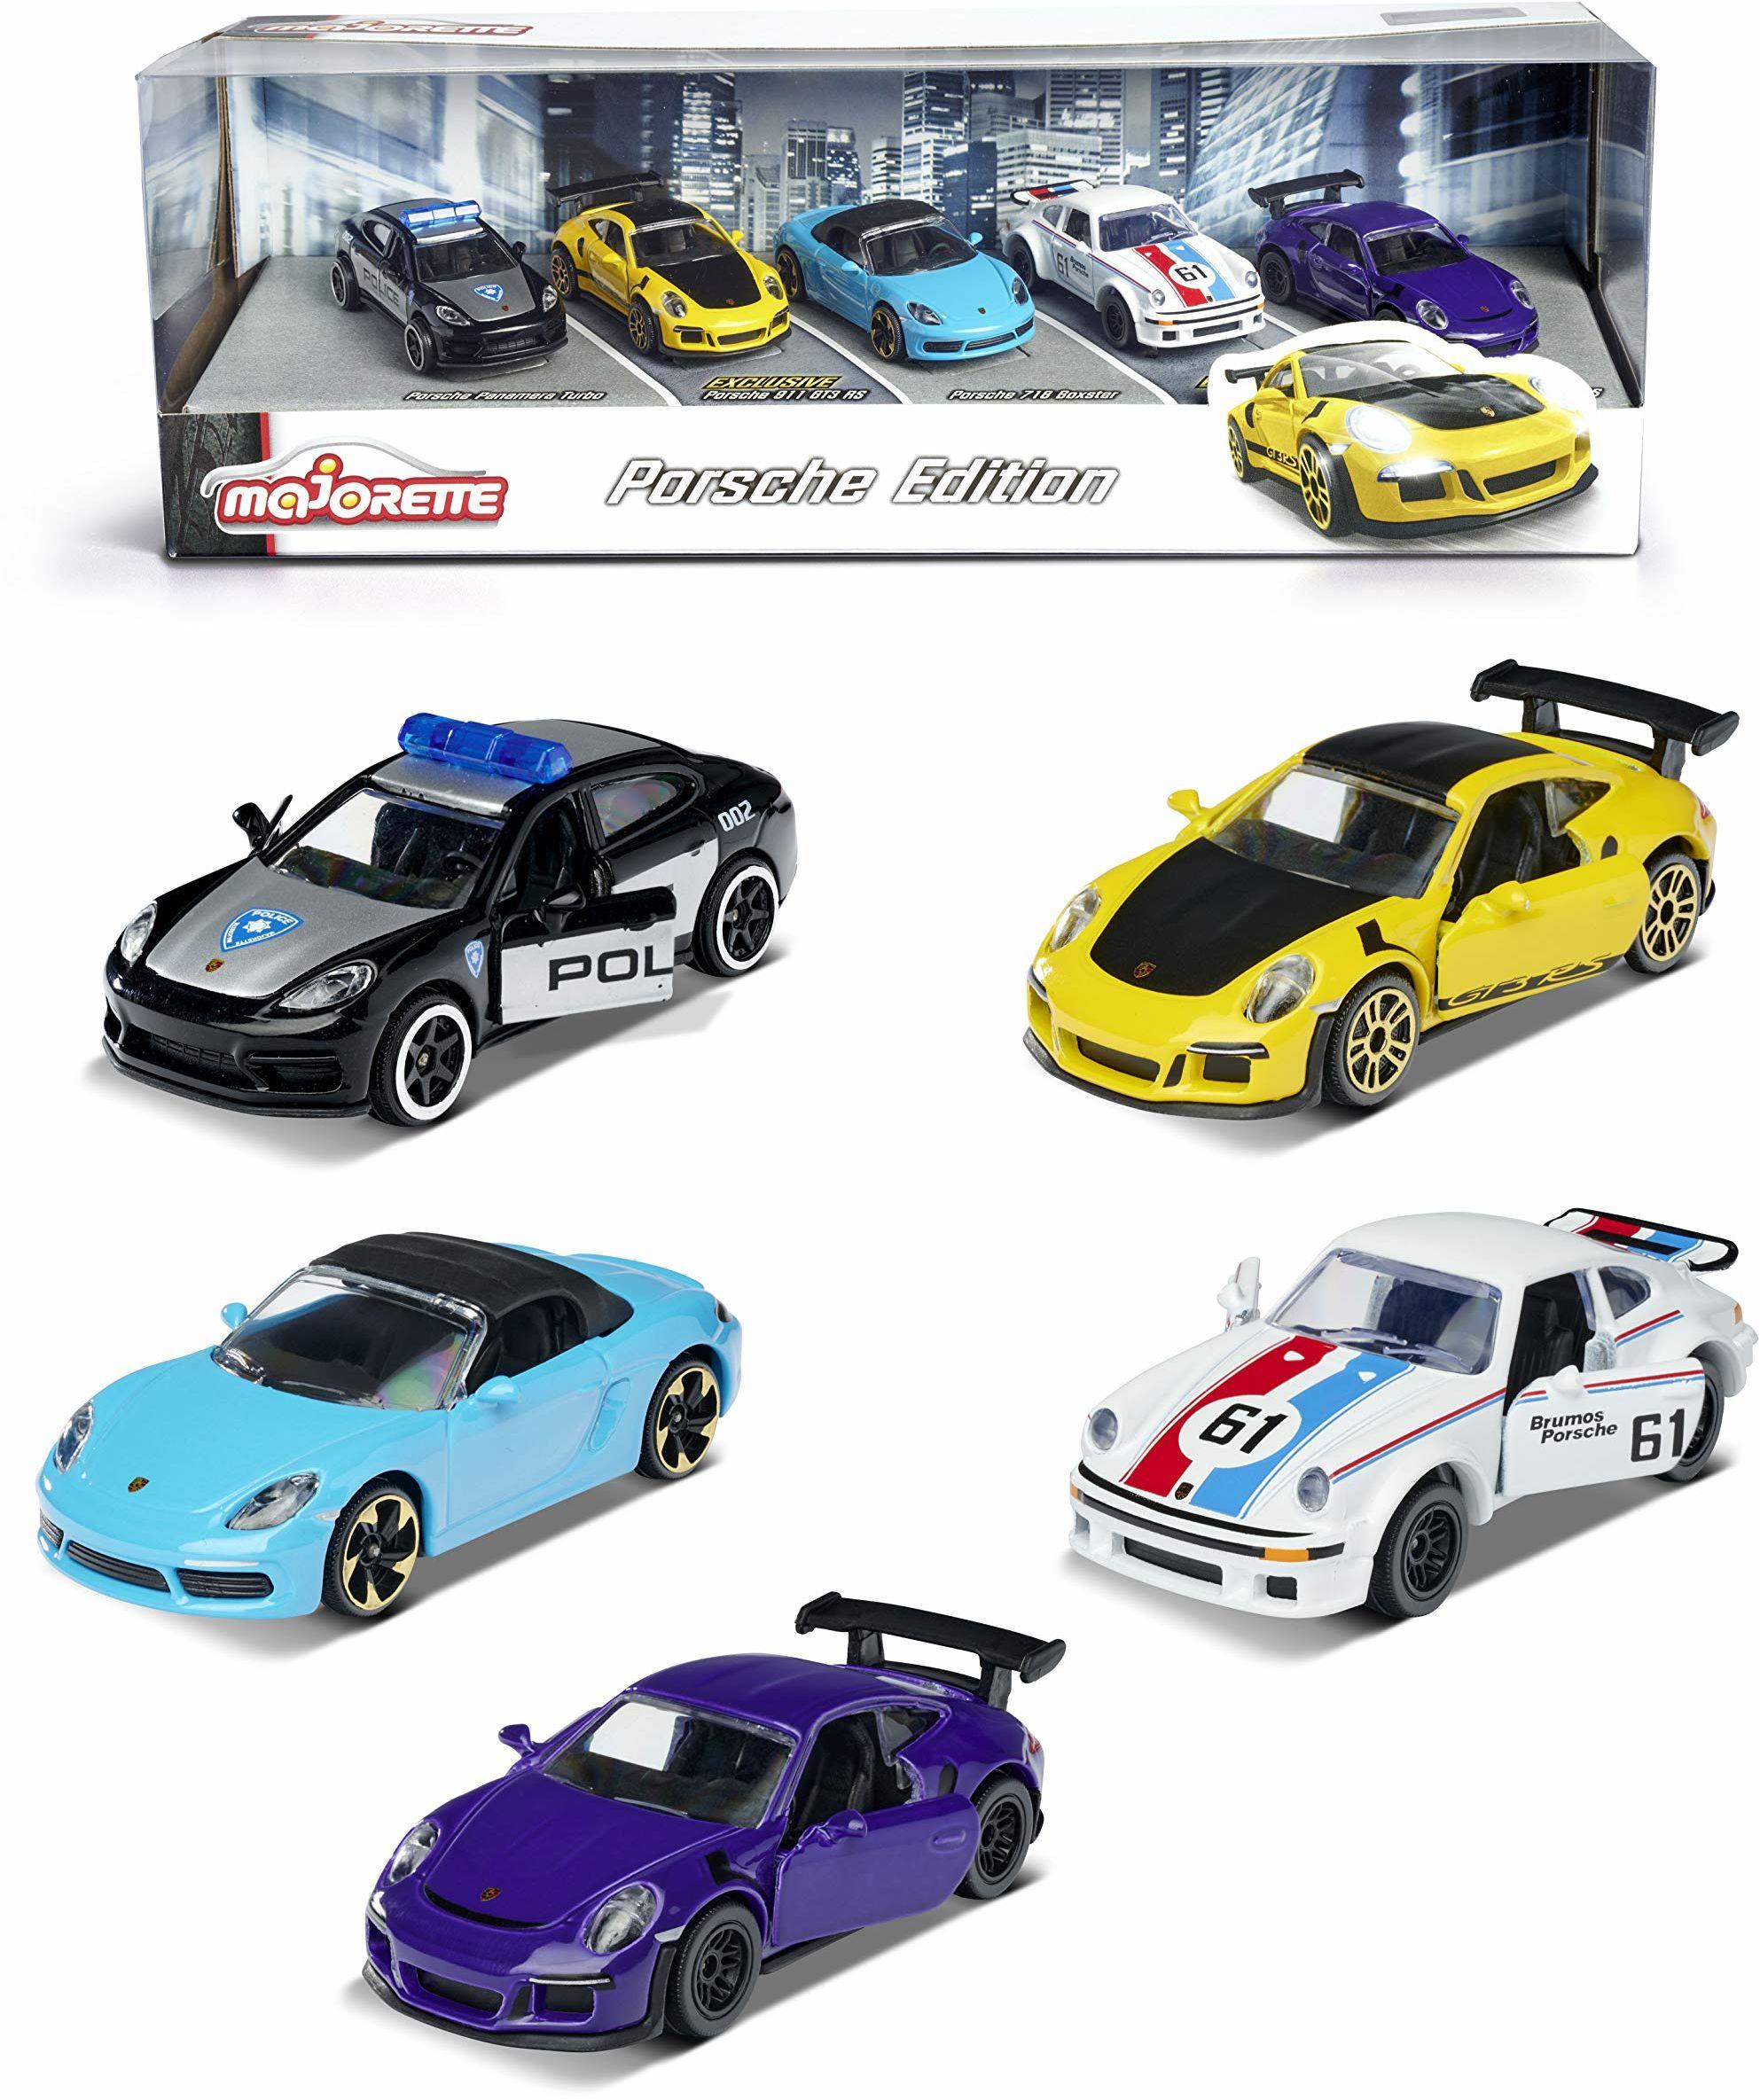 Majorette 212053171 Zestaw Porsche 212053171 5 Szt.